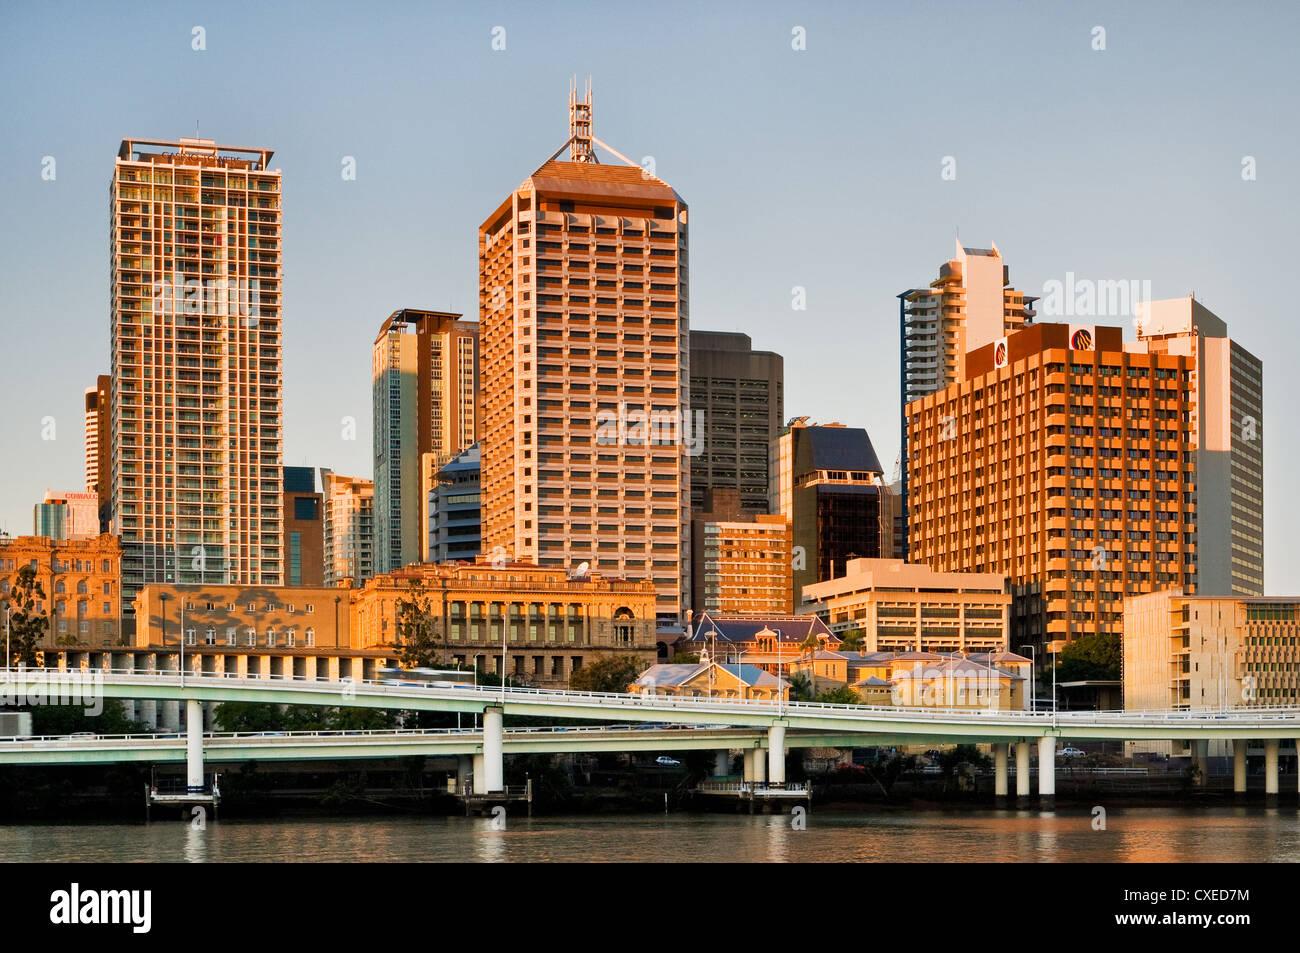 Skyline of Brisbane in evening light. - Stock Image